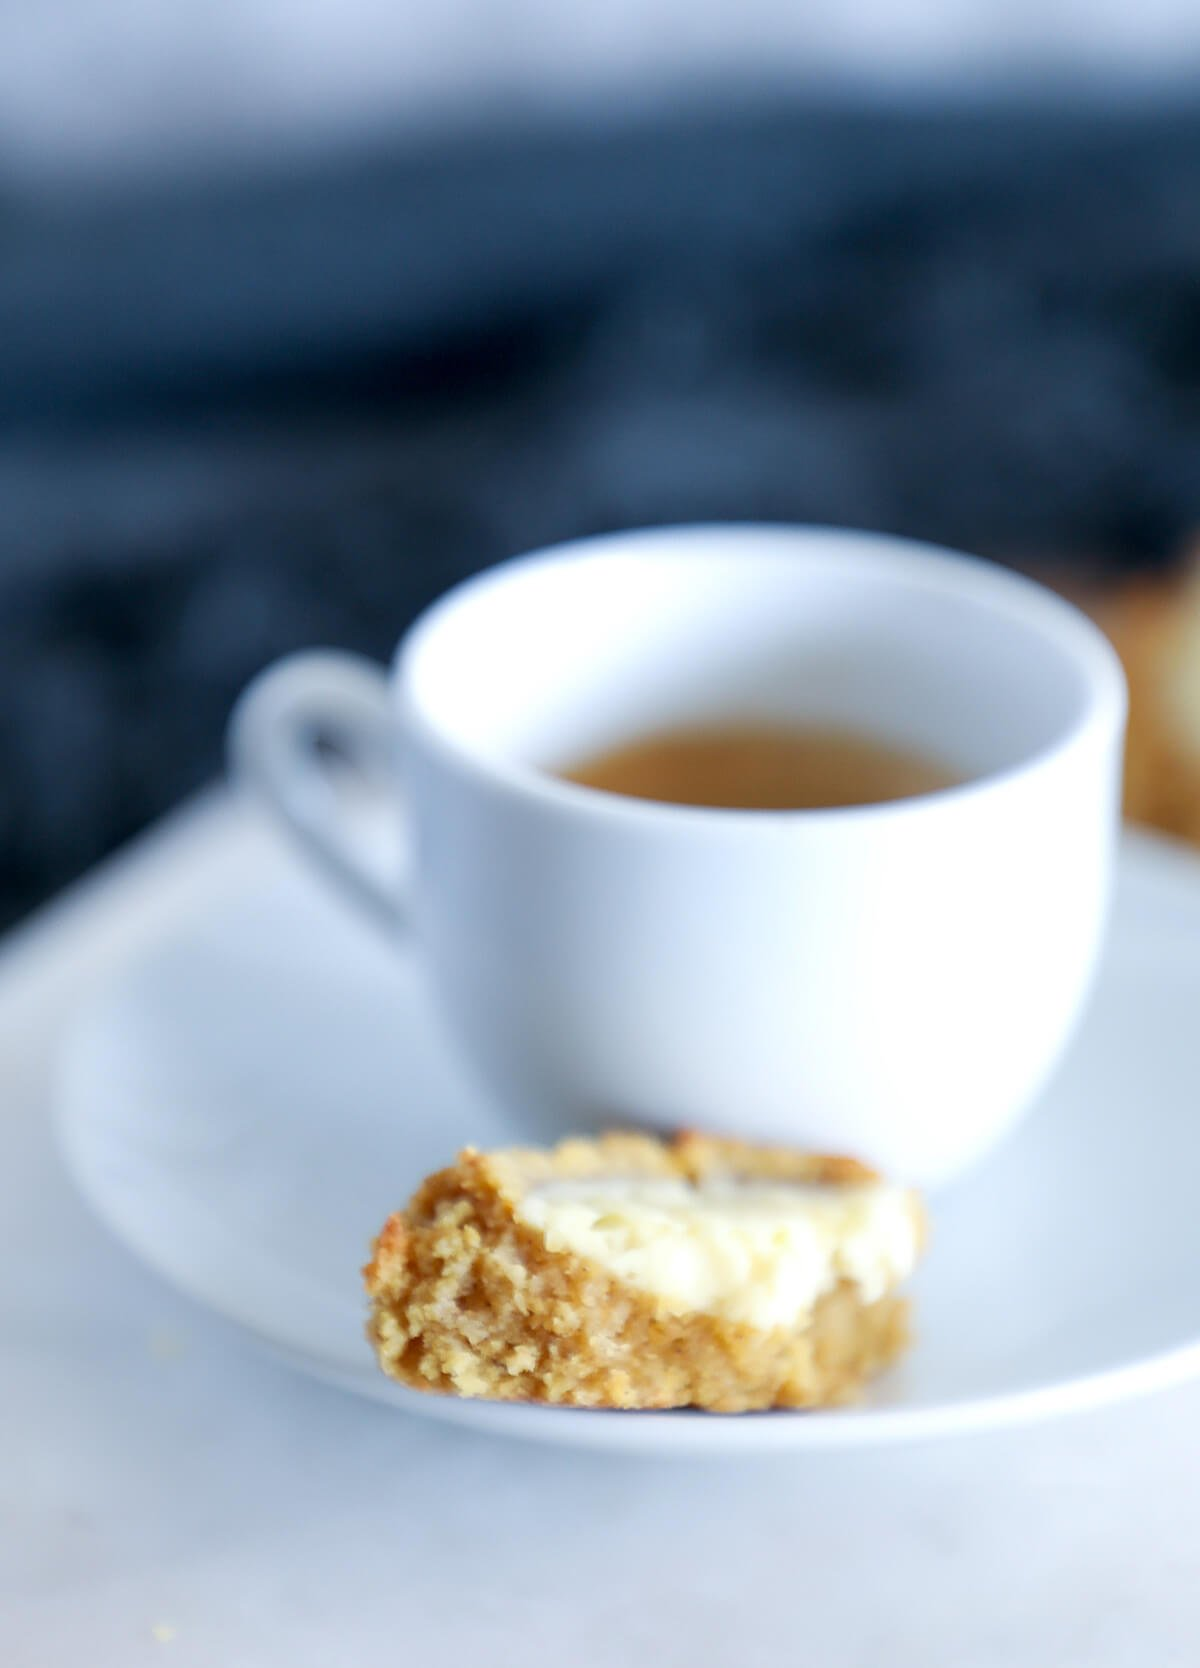 Keto Pumpkin Cheesecake Thumbprint cookies served with coffee in a white mug